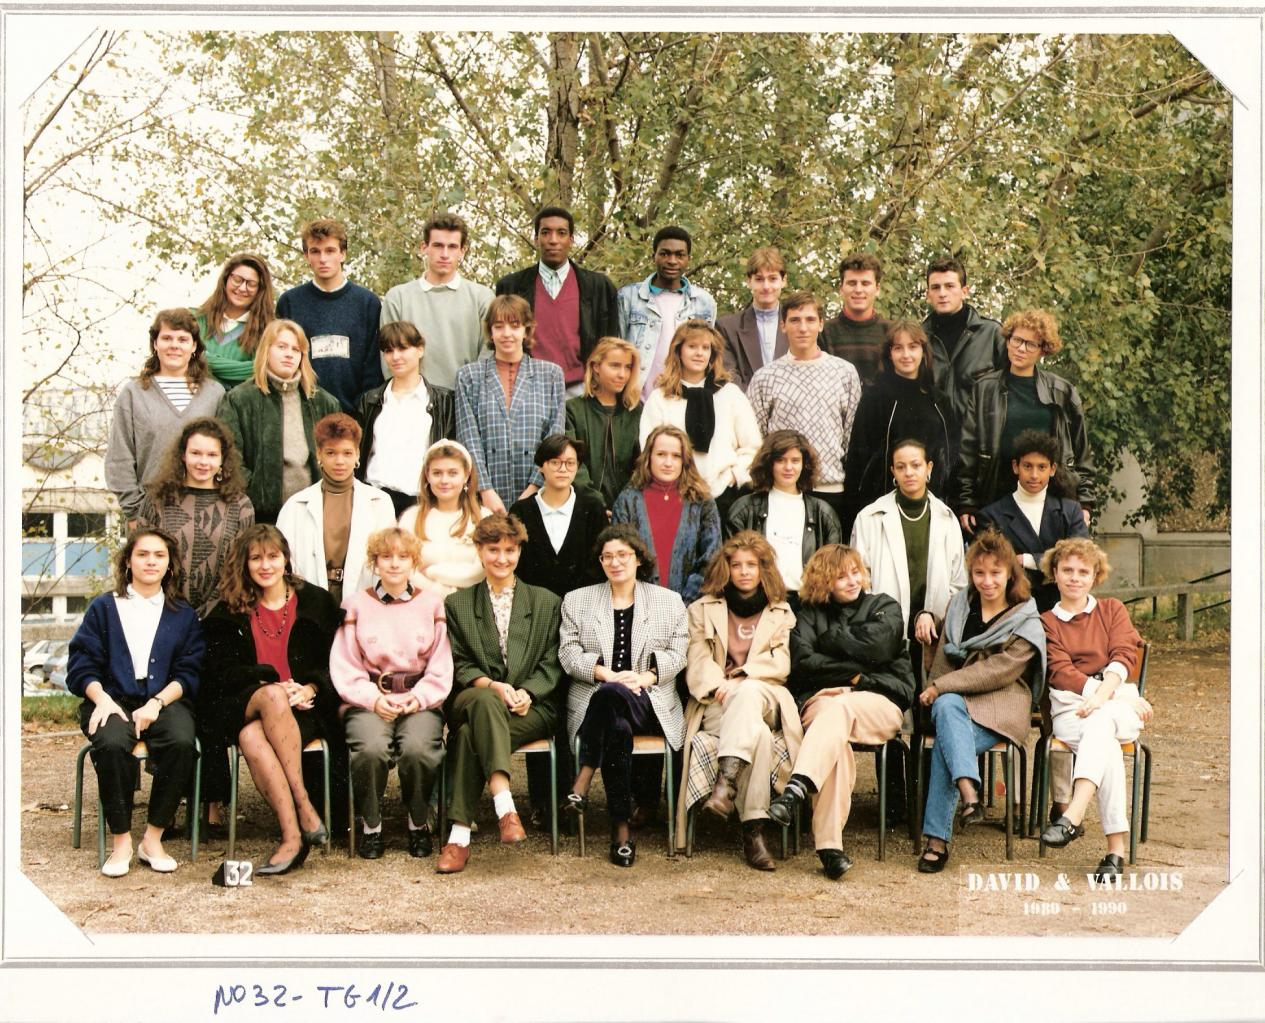 1990 - TG1